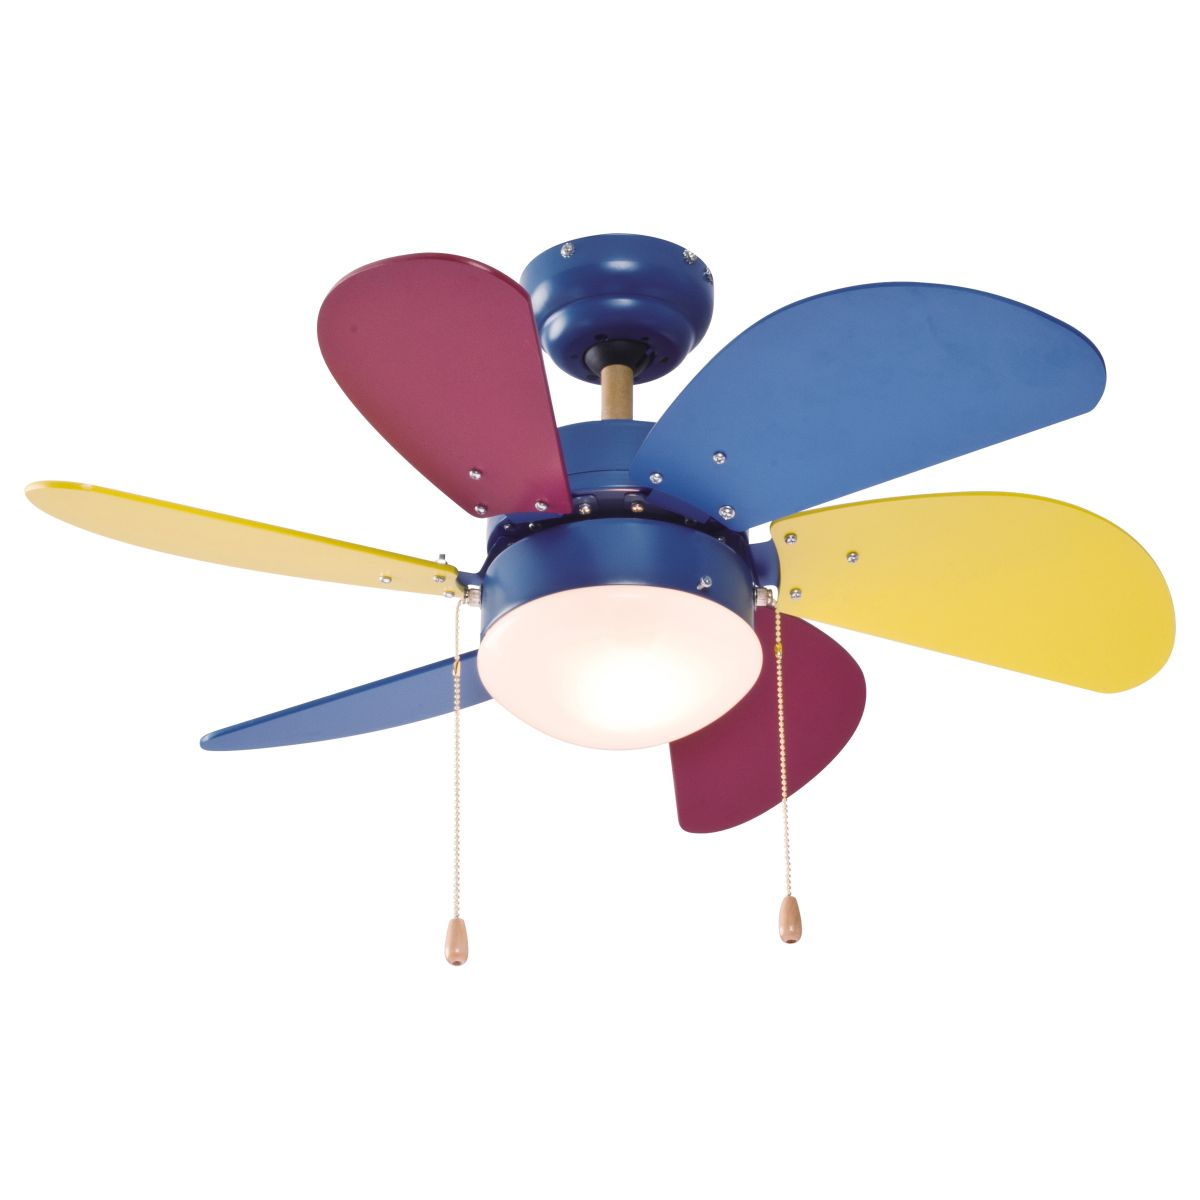 ventilatori a soffitto leroy merlin dj58 regardsdefemmes On ventilatori da soffitto leroy merlin